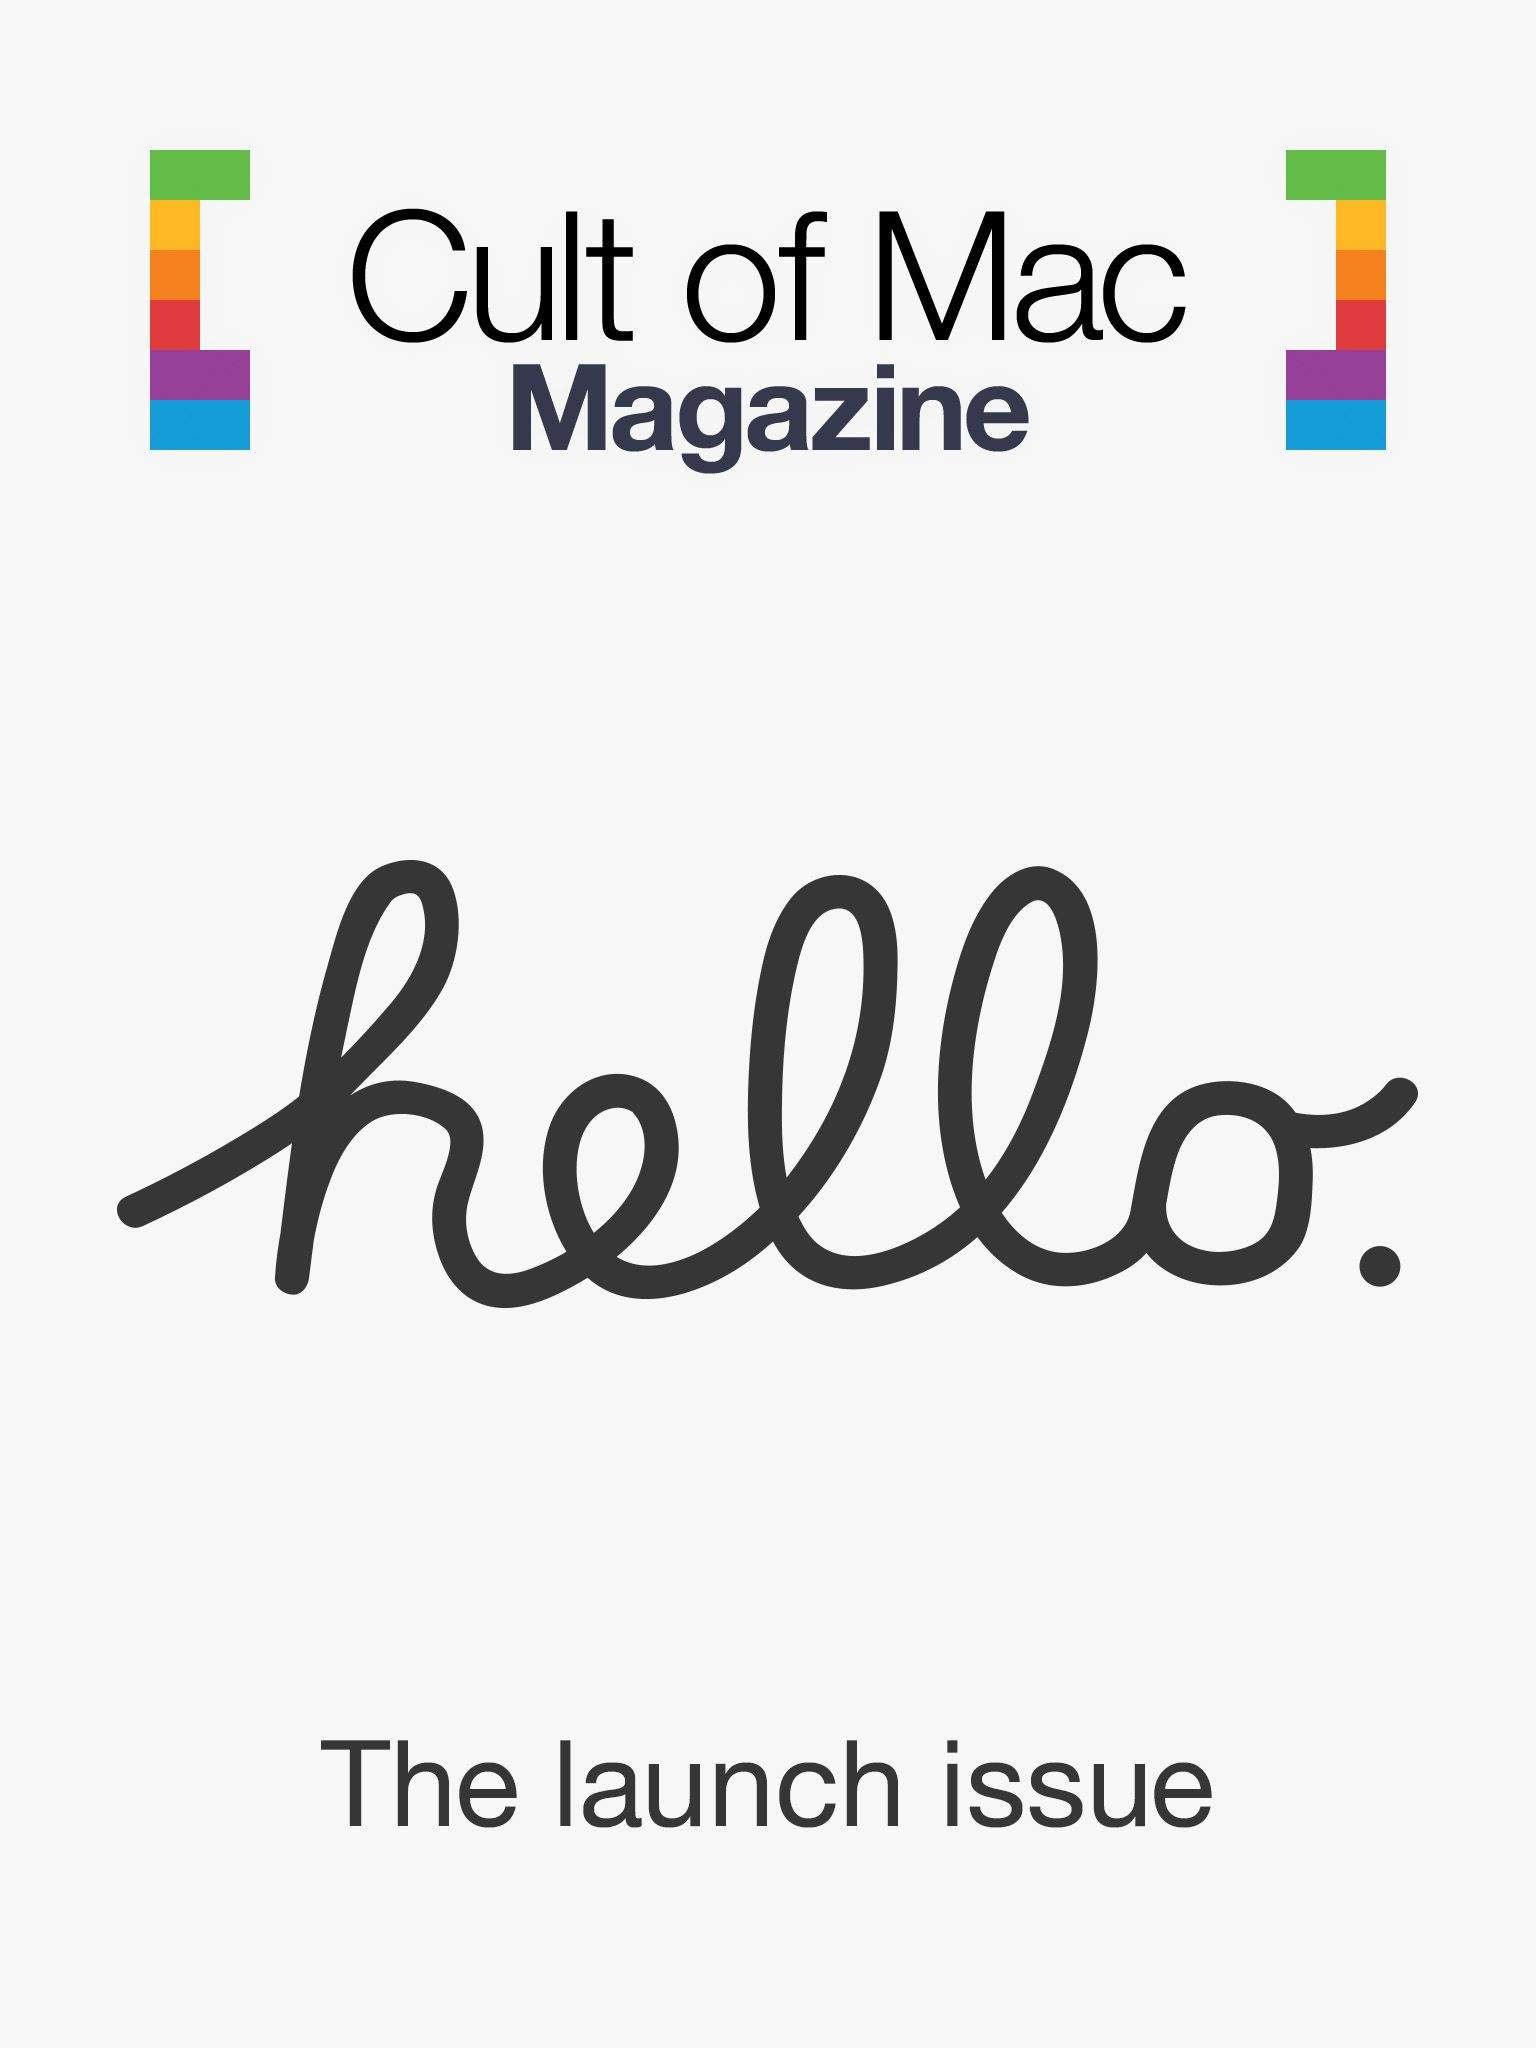 Cult of Mac Magazine, the Hello World Issue